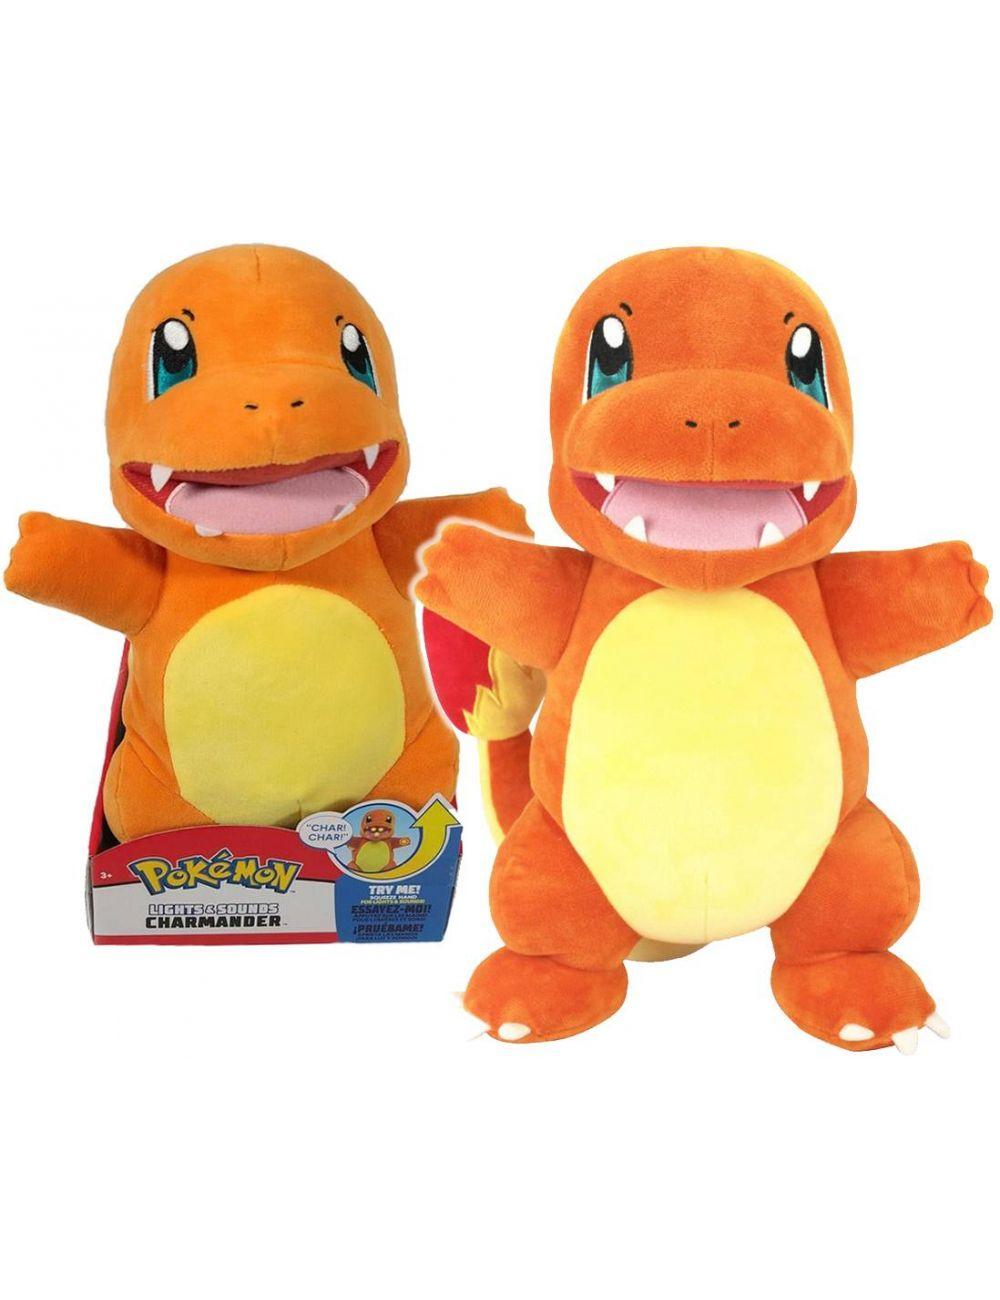 Pokemon Pluszak Interaktywny Charmander